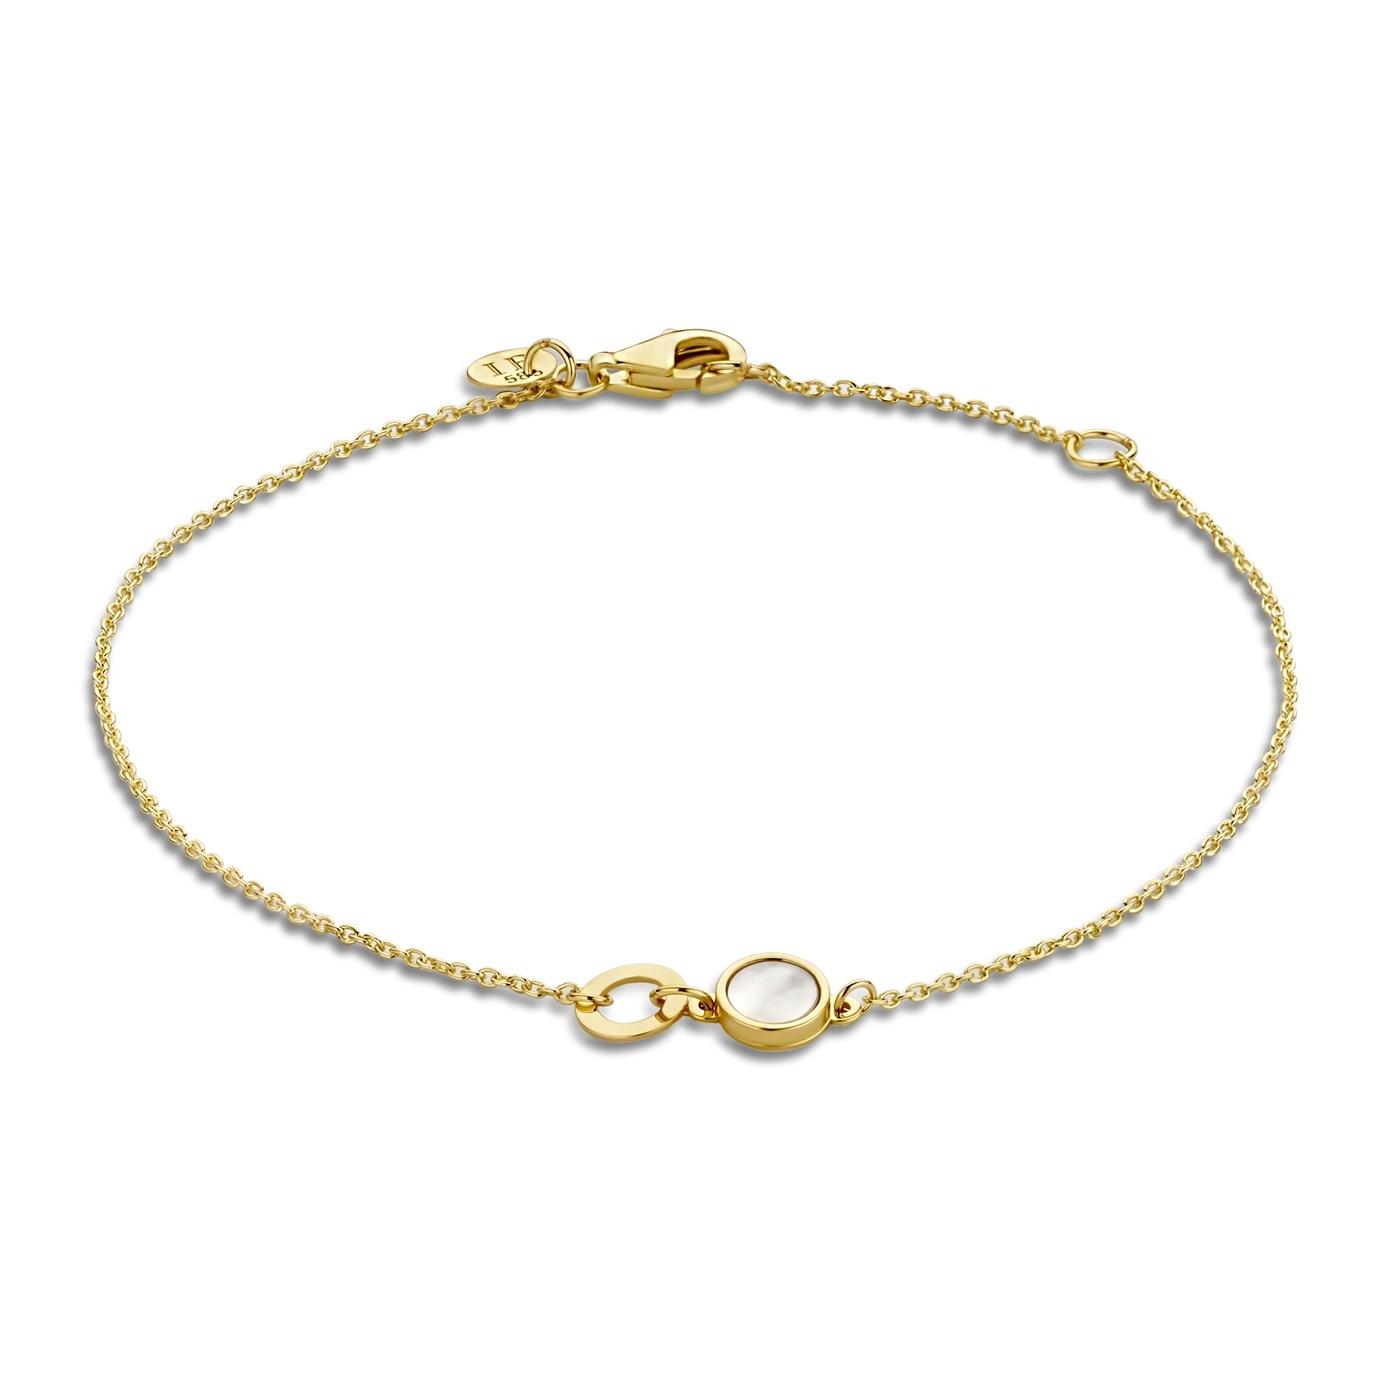 Isabel Bernard Belleville Sofia bracciale in oro 14 carati